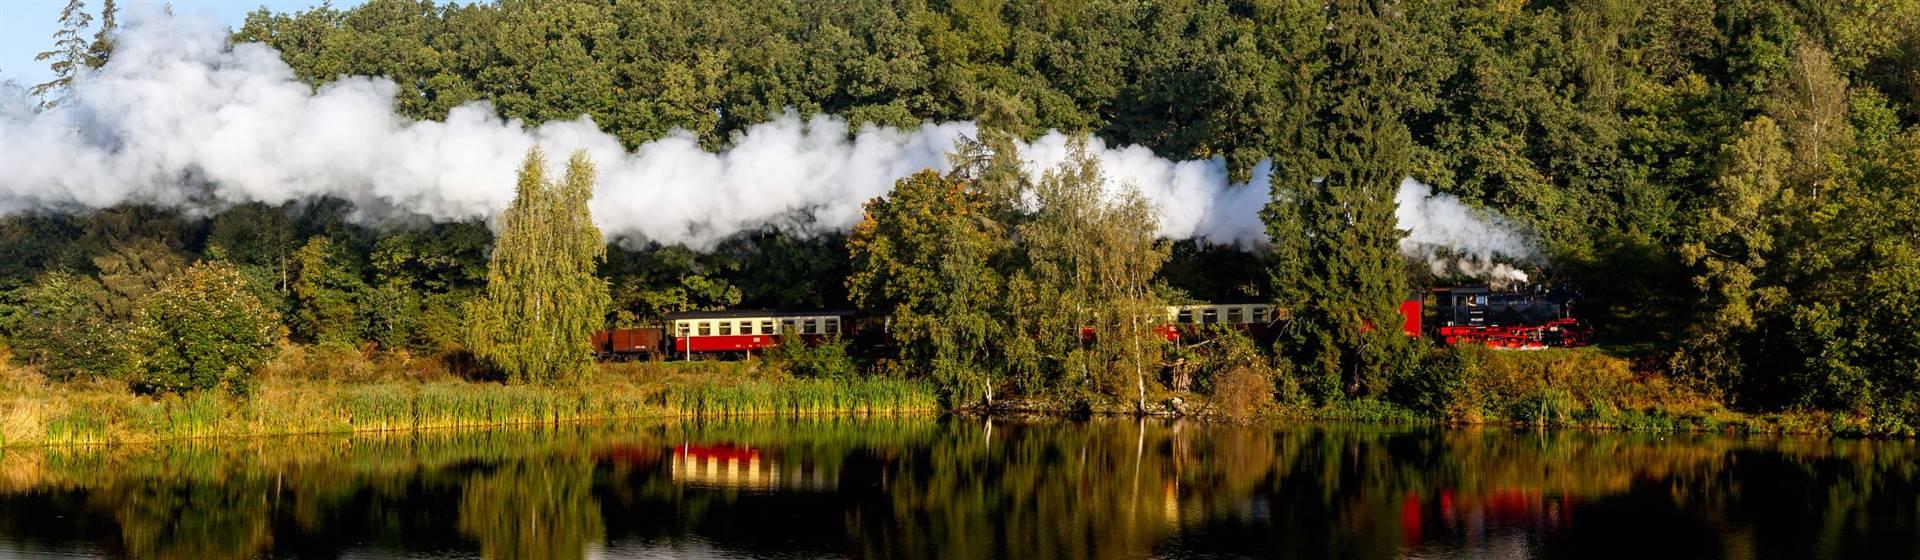 "<img src=""germansteamtrain-shutterstock.jpeg"" alt=""HSB Train""/>"